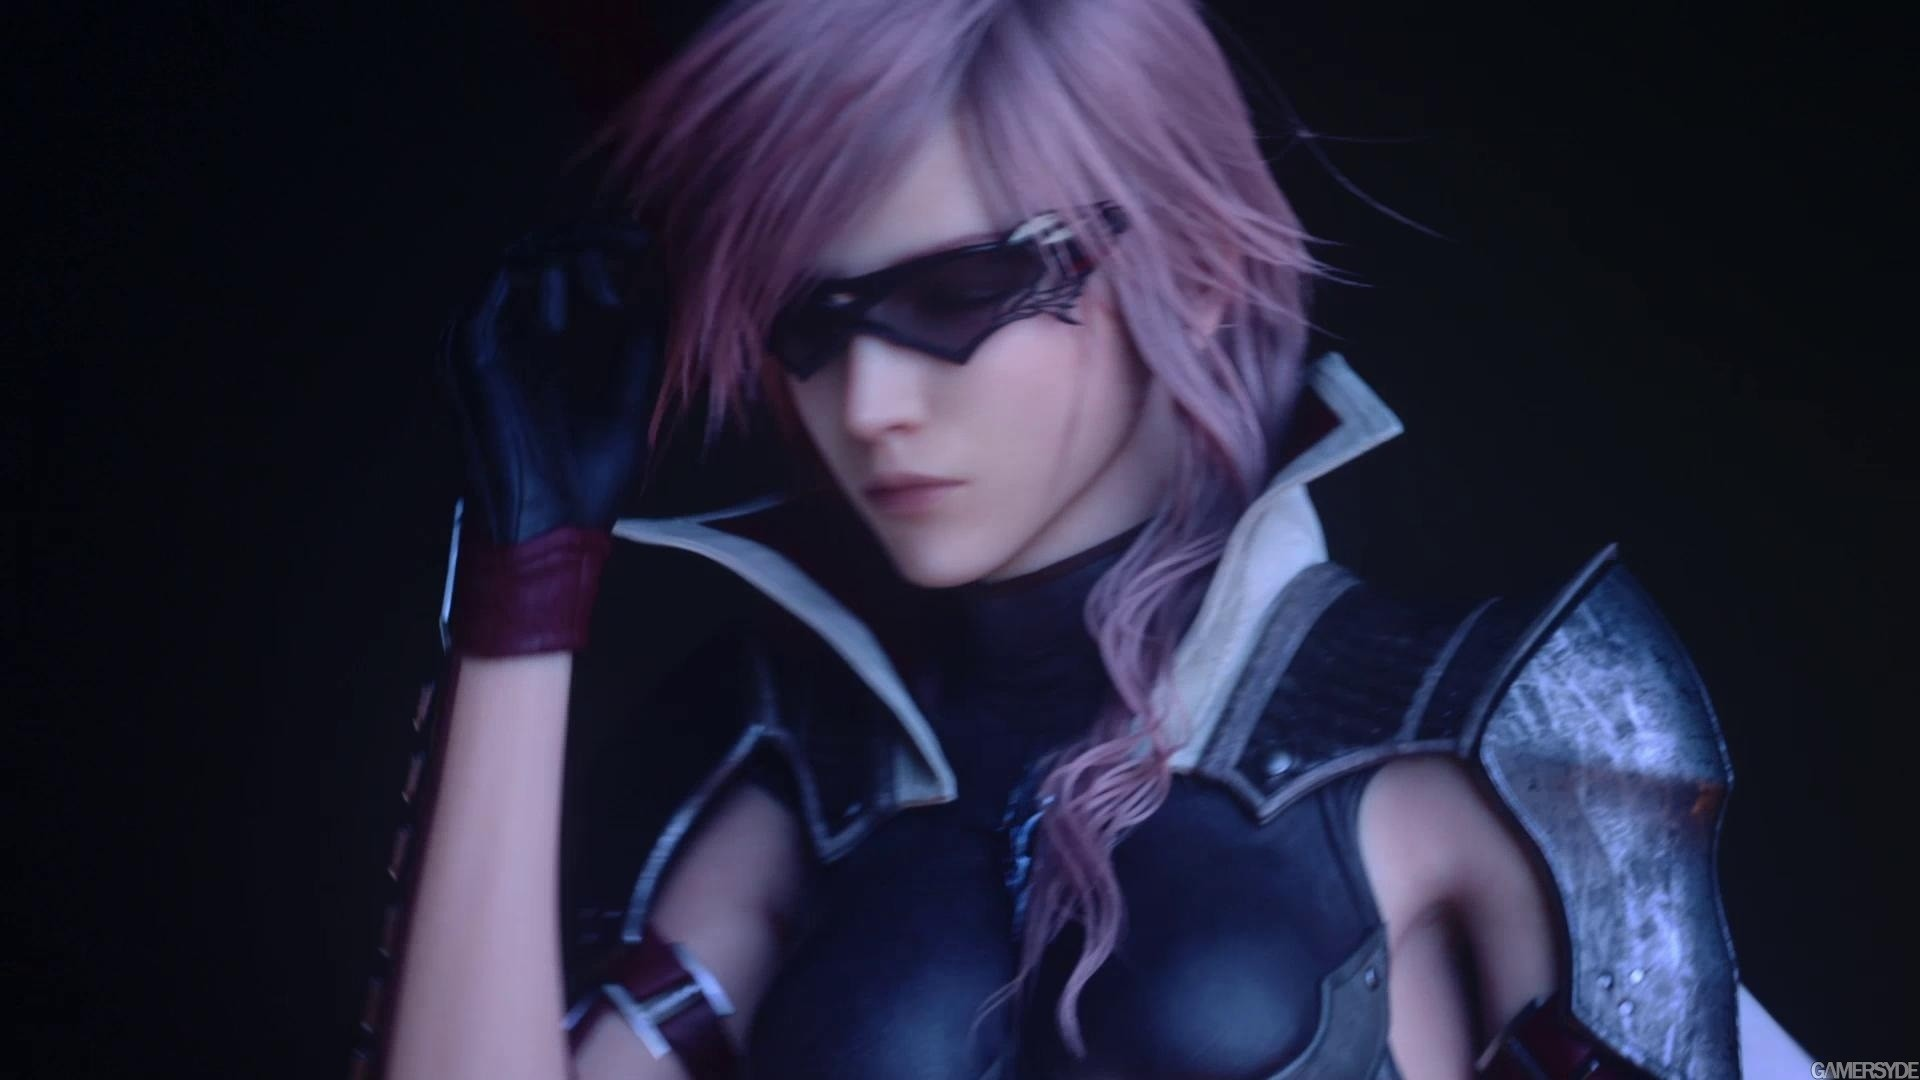 Lightning Final Fantasy Wallpaper (72+ Images